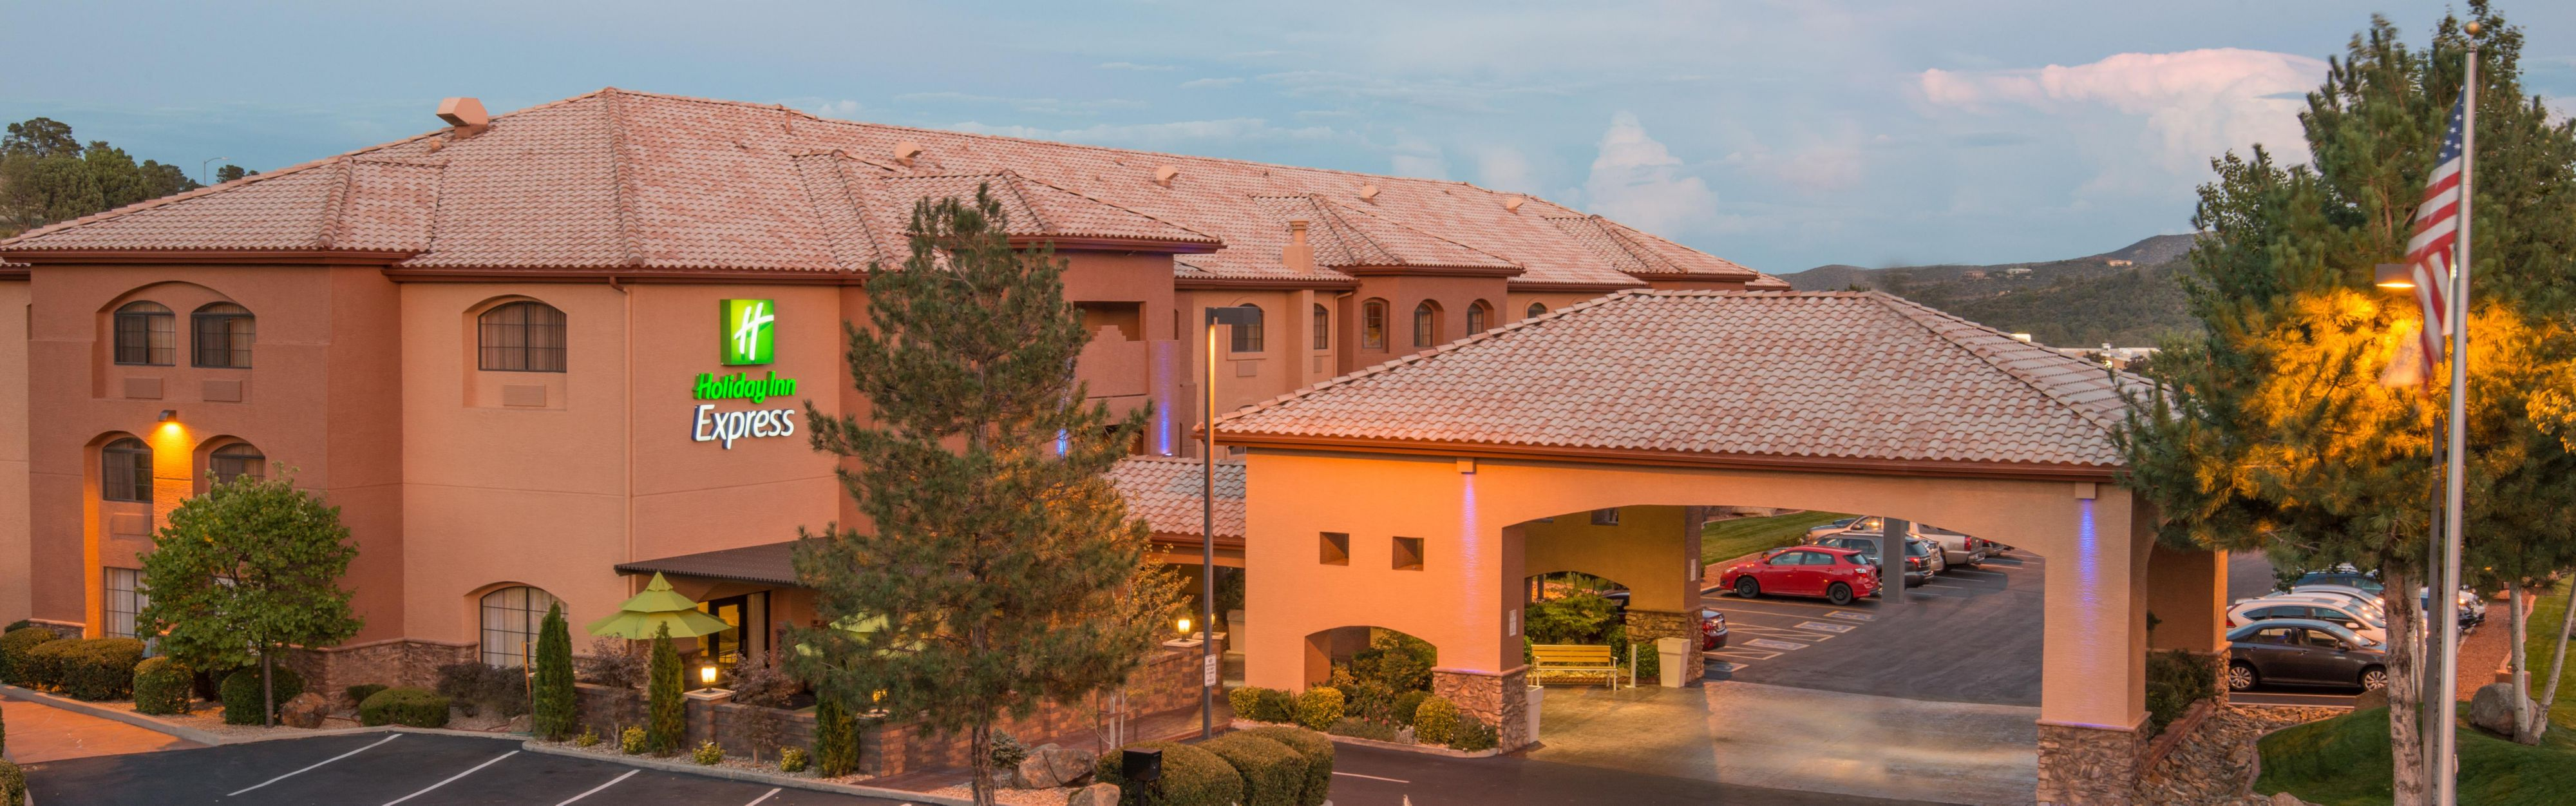 Holiday Inn Express Prescott image 0